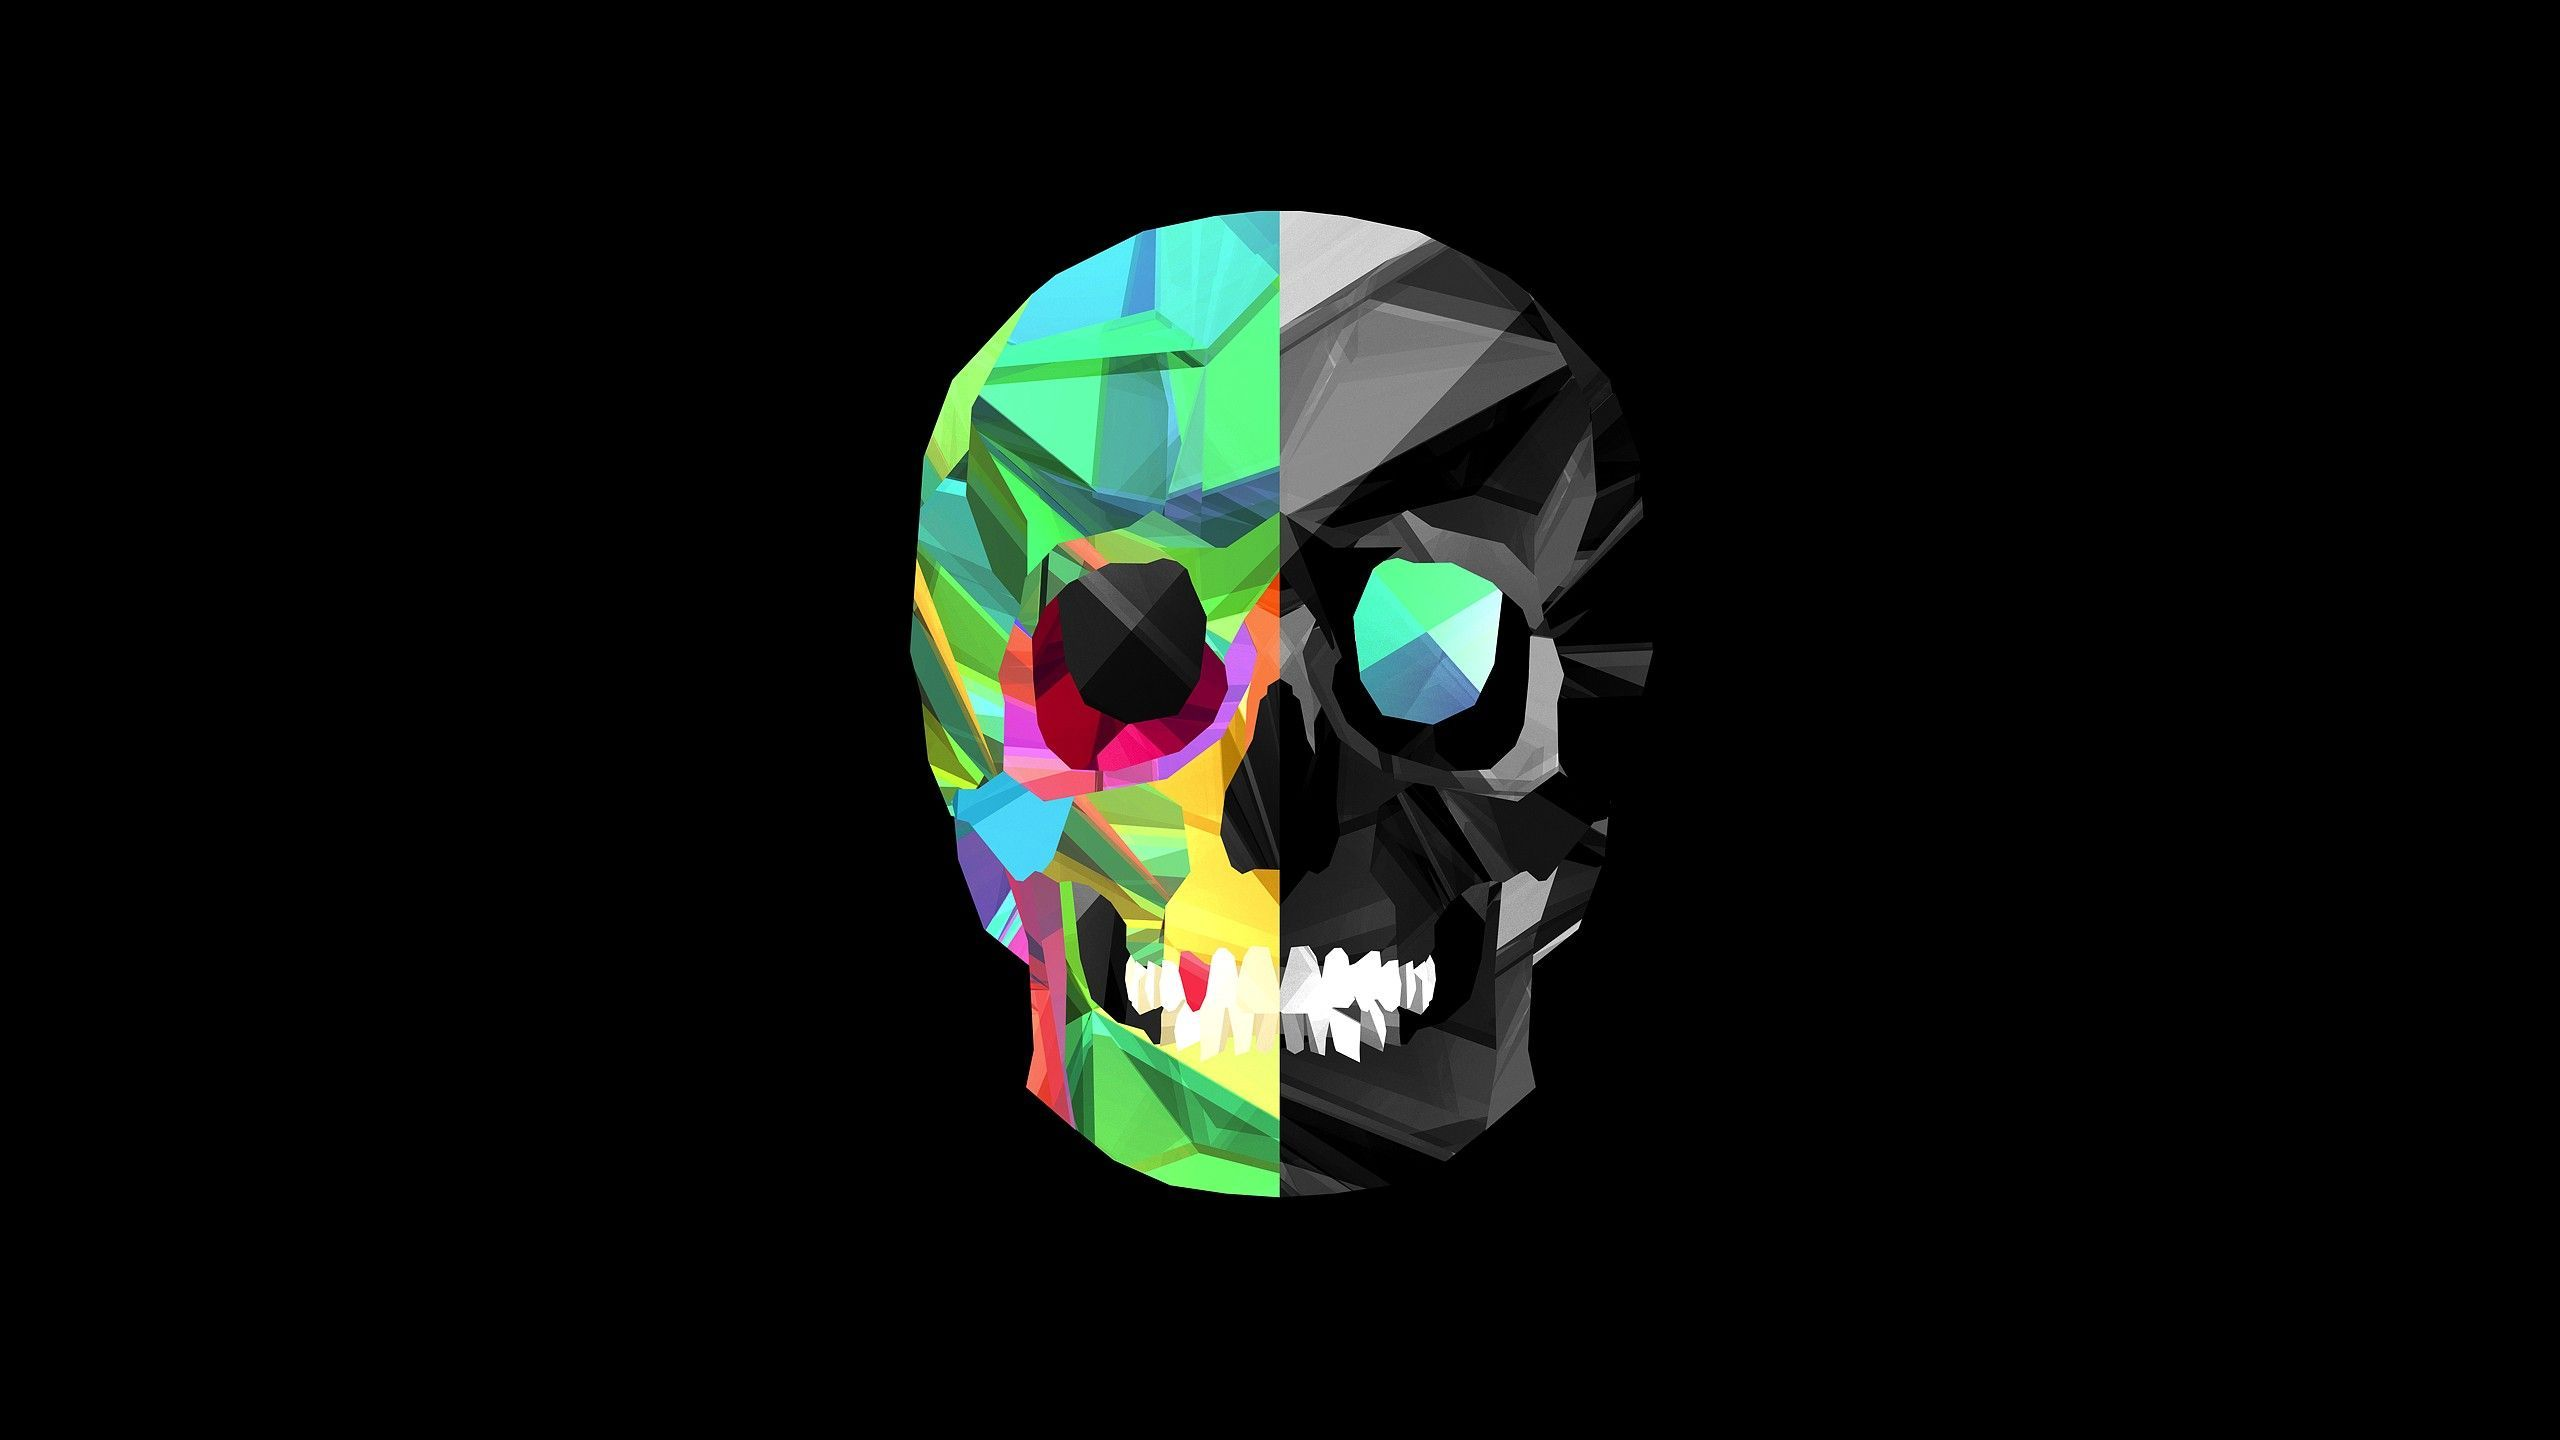 Digital Art Skull Wallpaper 2560x1440 Id 53929 Wallpaper Tengkorak Wallpaper Komputer Wallpaper Keren